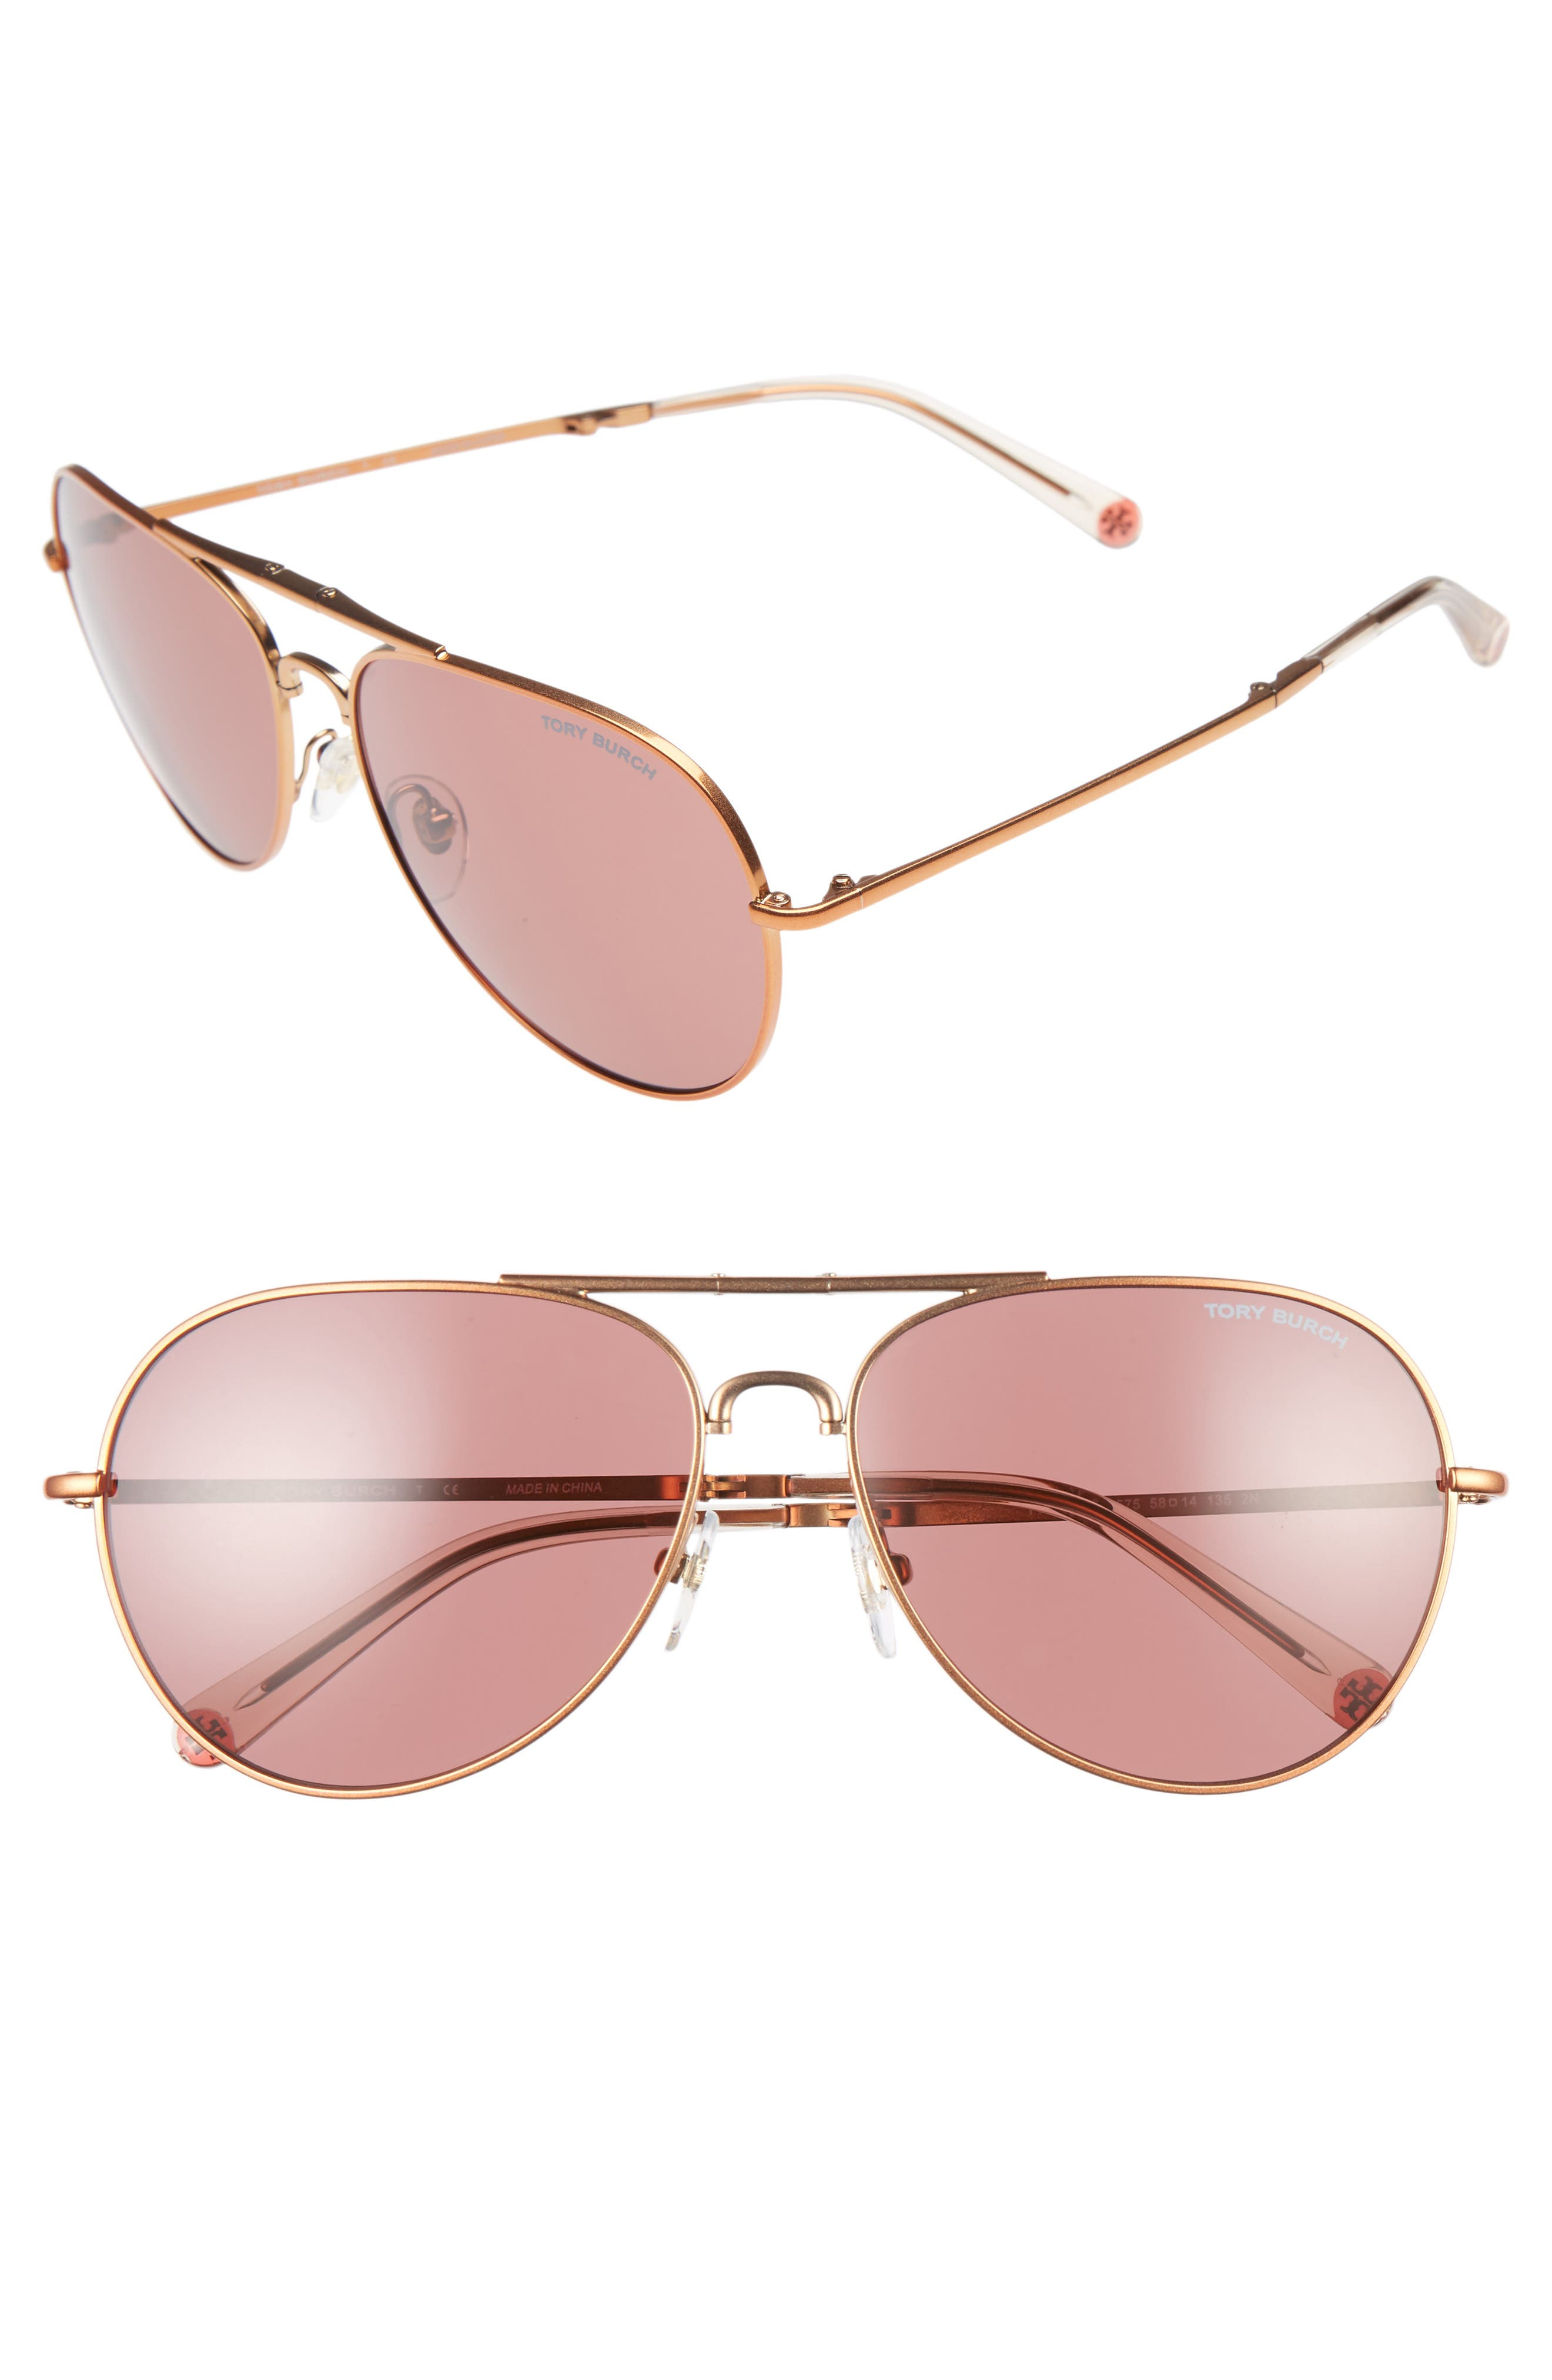 Alternate Image 1 Selected - Tory Burch 58mm Foldable Aviator Sunglasses